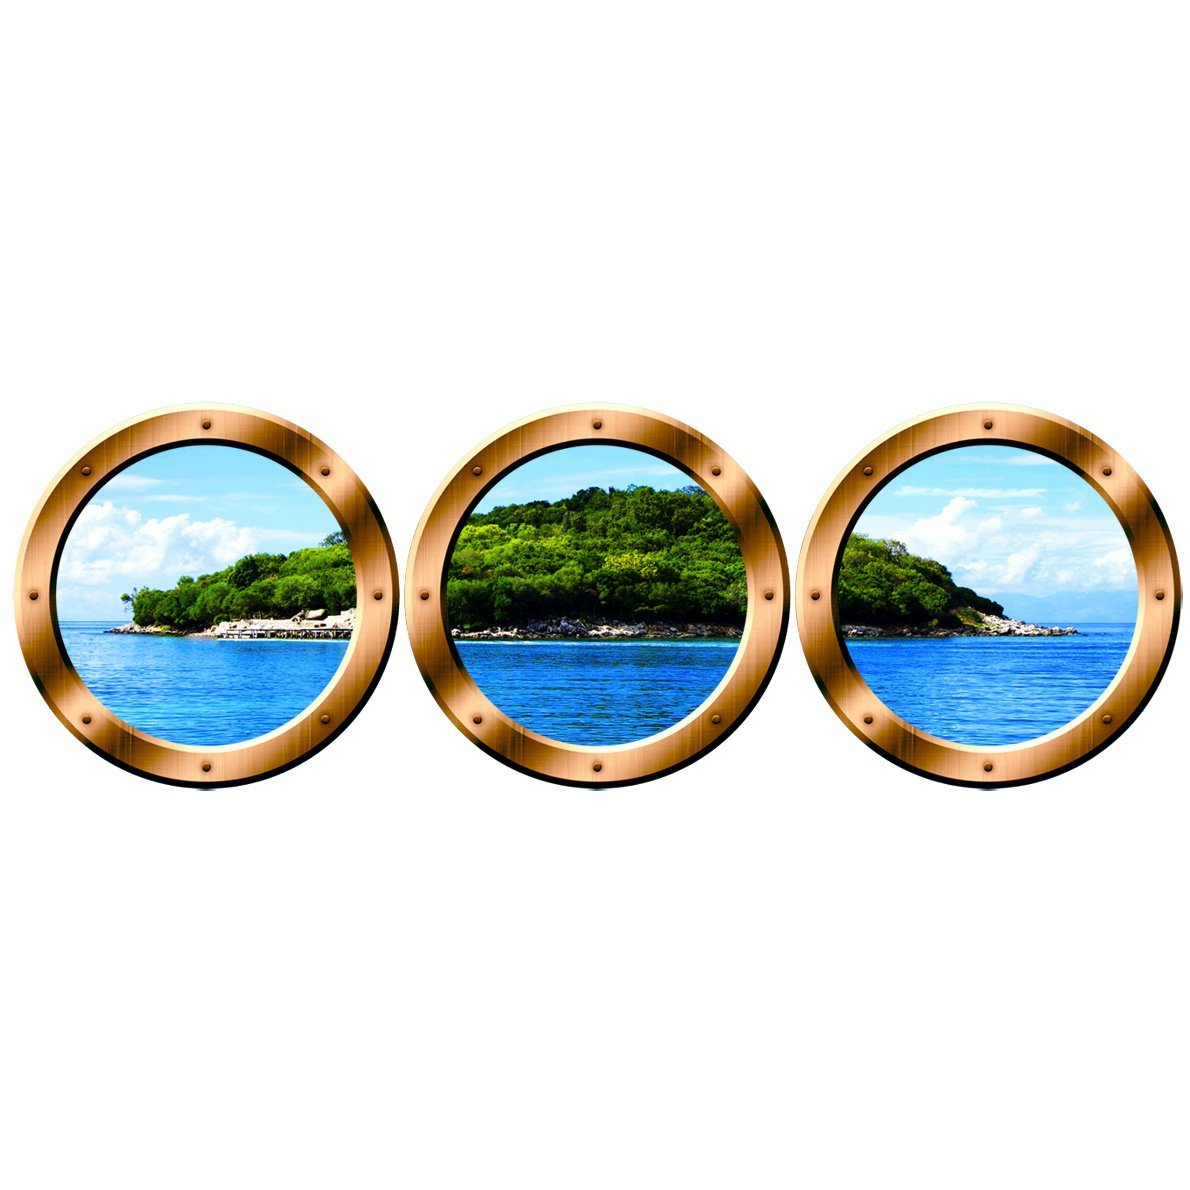 "VWAQ Wall Art Portholes - Nature Window Clings, Cruise Ship Decals - VWAQ-SPW8 (20"" Diameter, Silver)"